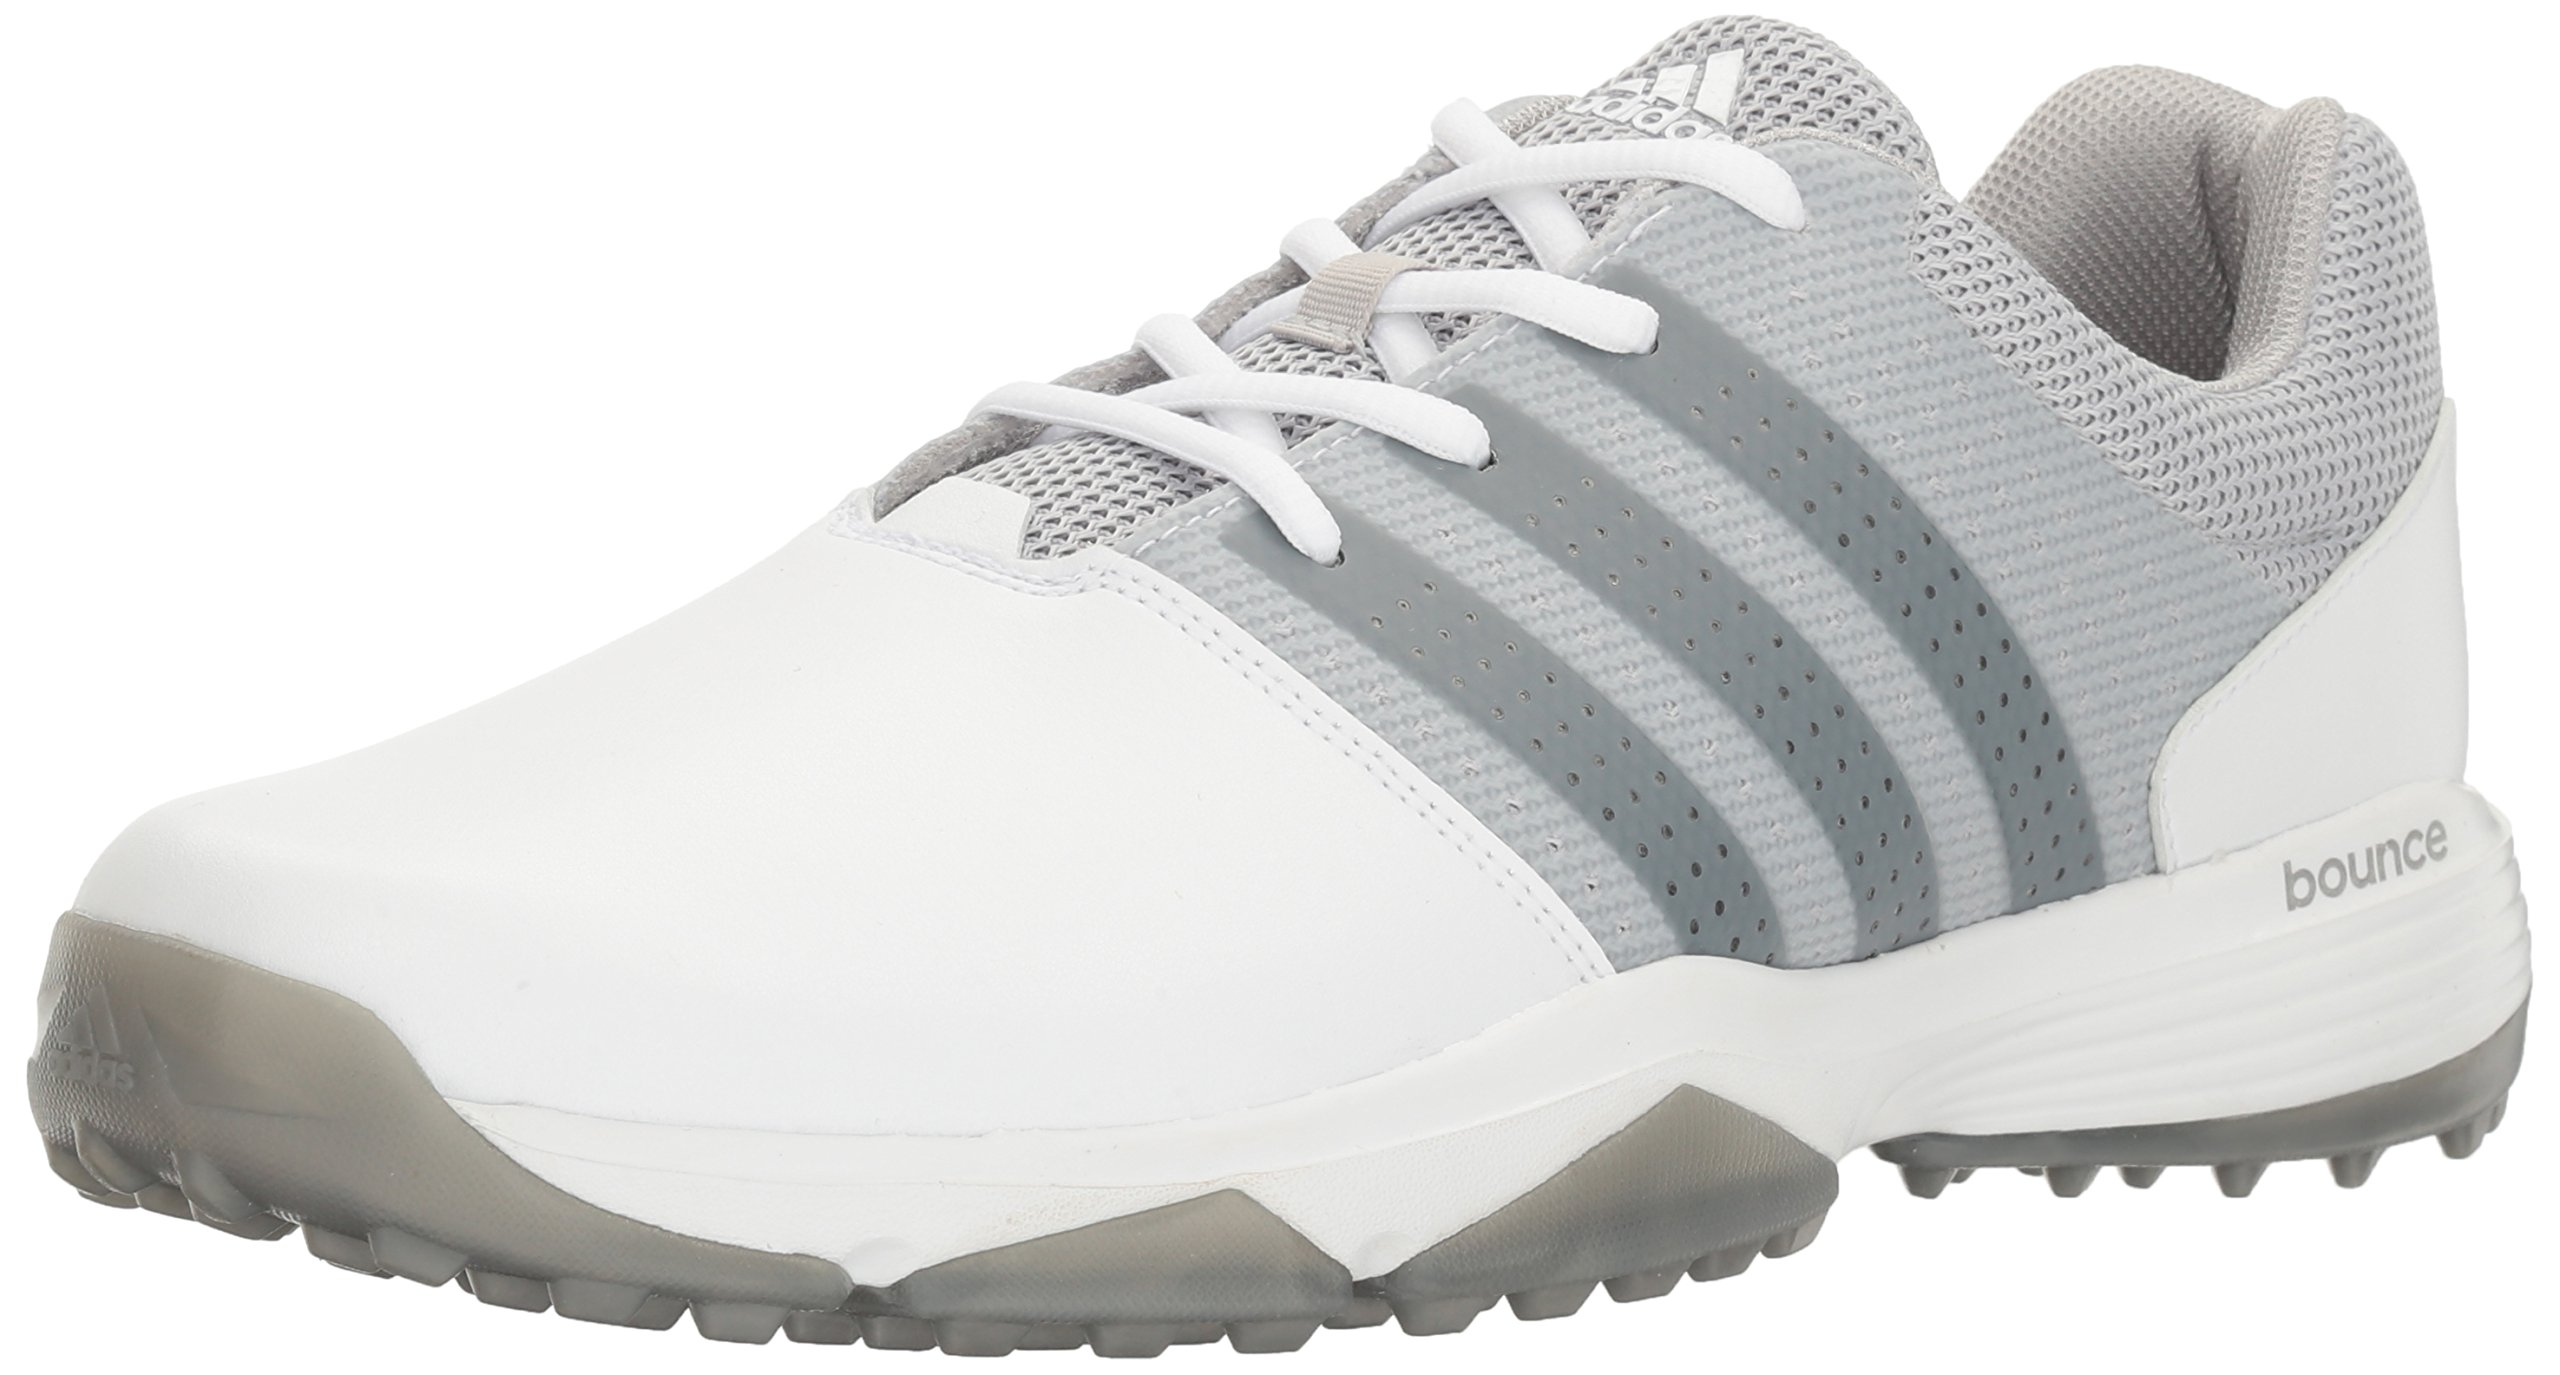 Barato Adidas ofertas 360, encontrar Adidas 360 ofertas Adidas en línea en 7351a1 479995